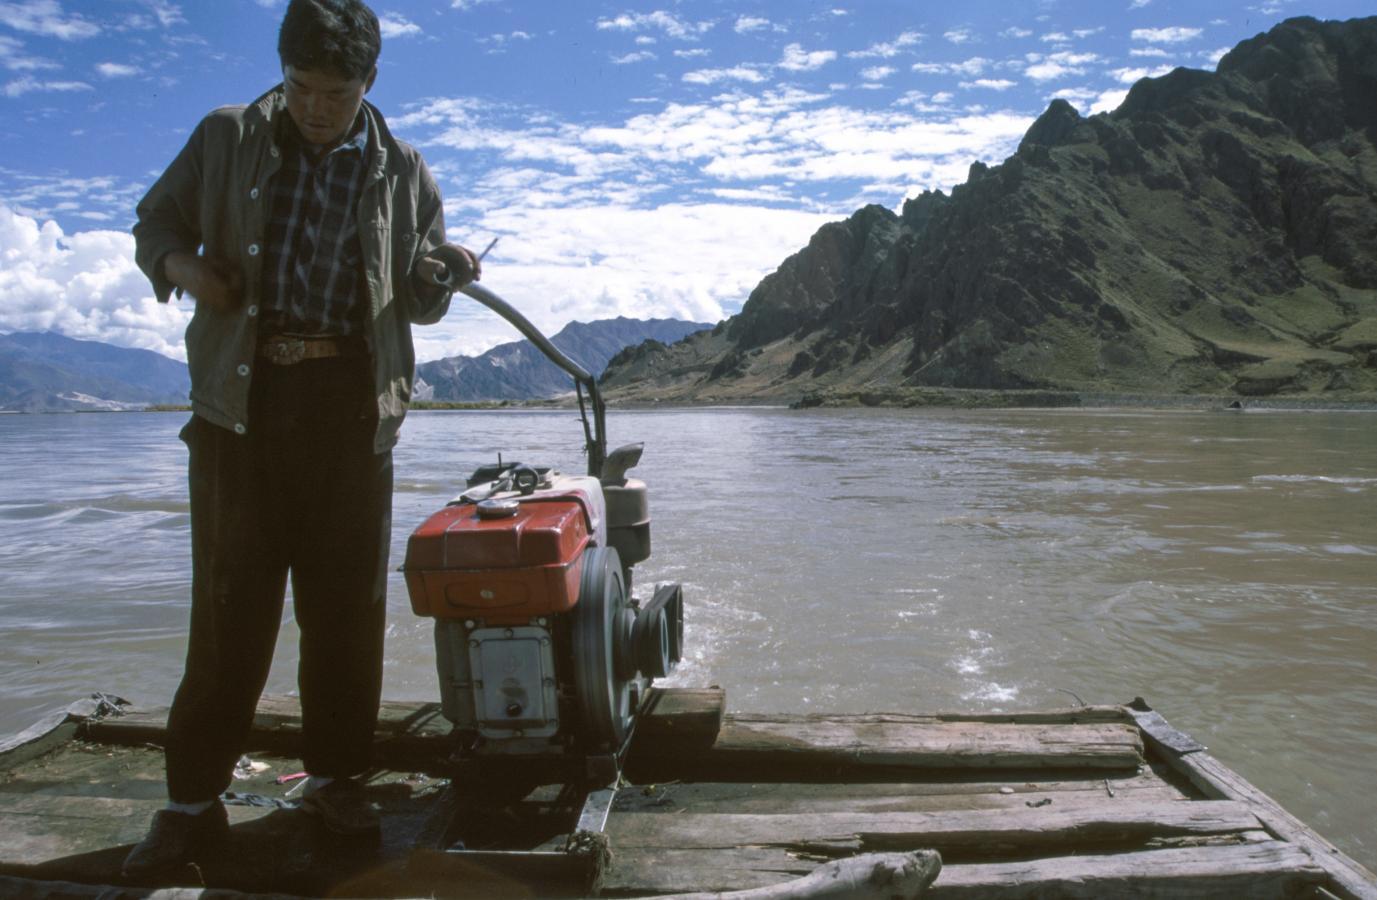 tsangpo-ferry-to-samye-monastery-tibet-2000